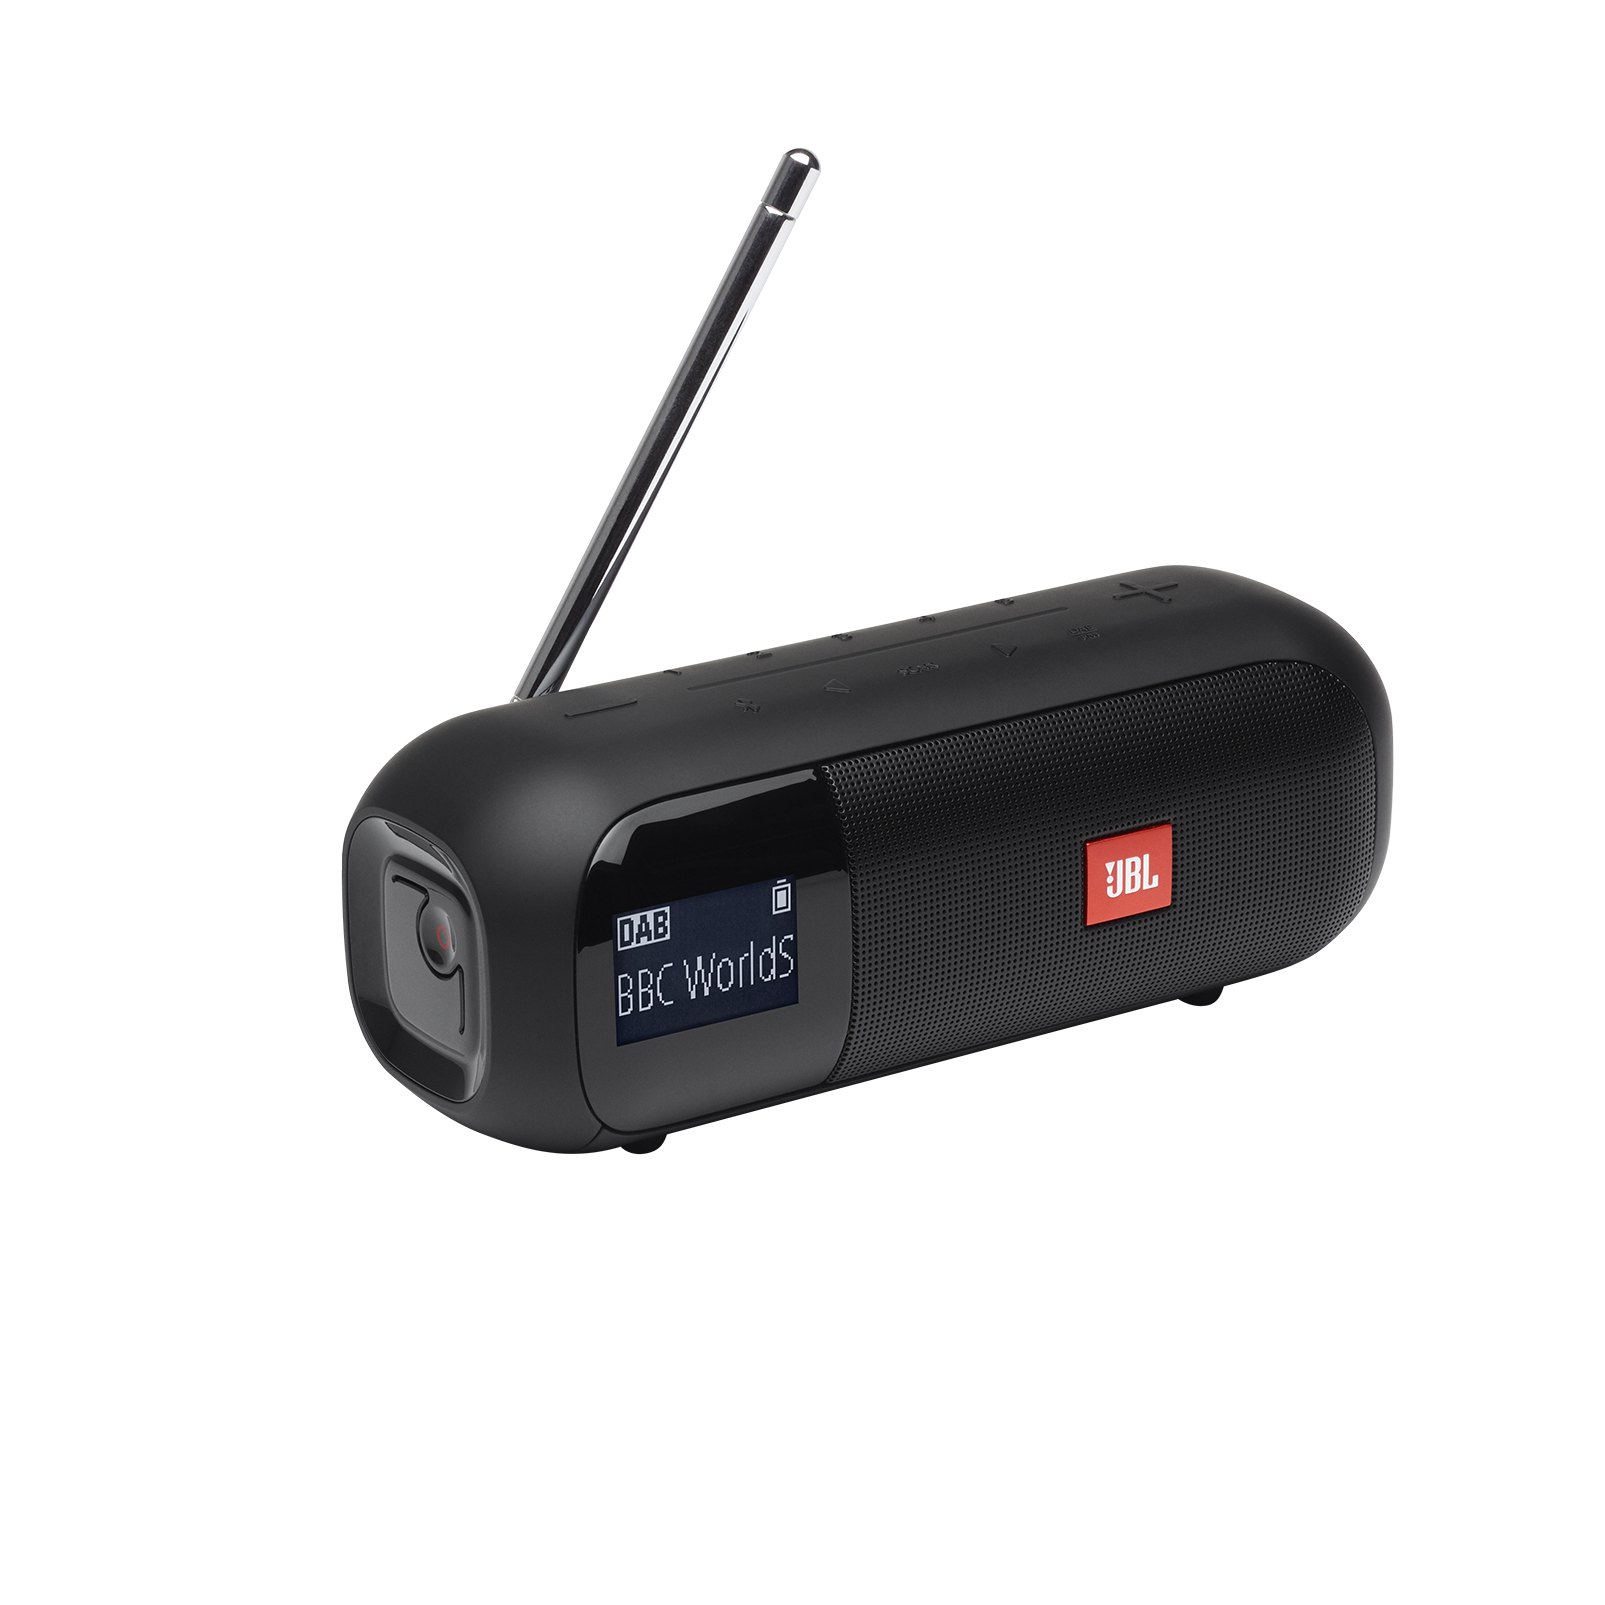 JBL Tuner 2 - Black - Portable DAB/DAB+/FM radio with Bluetooth - Hero